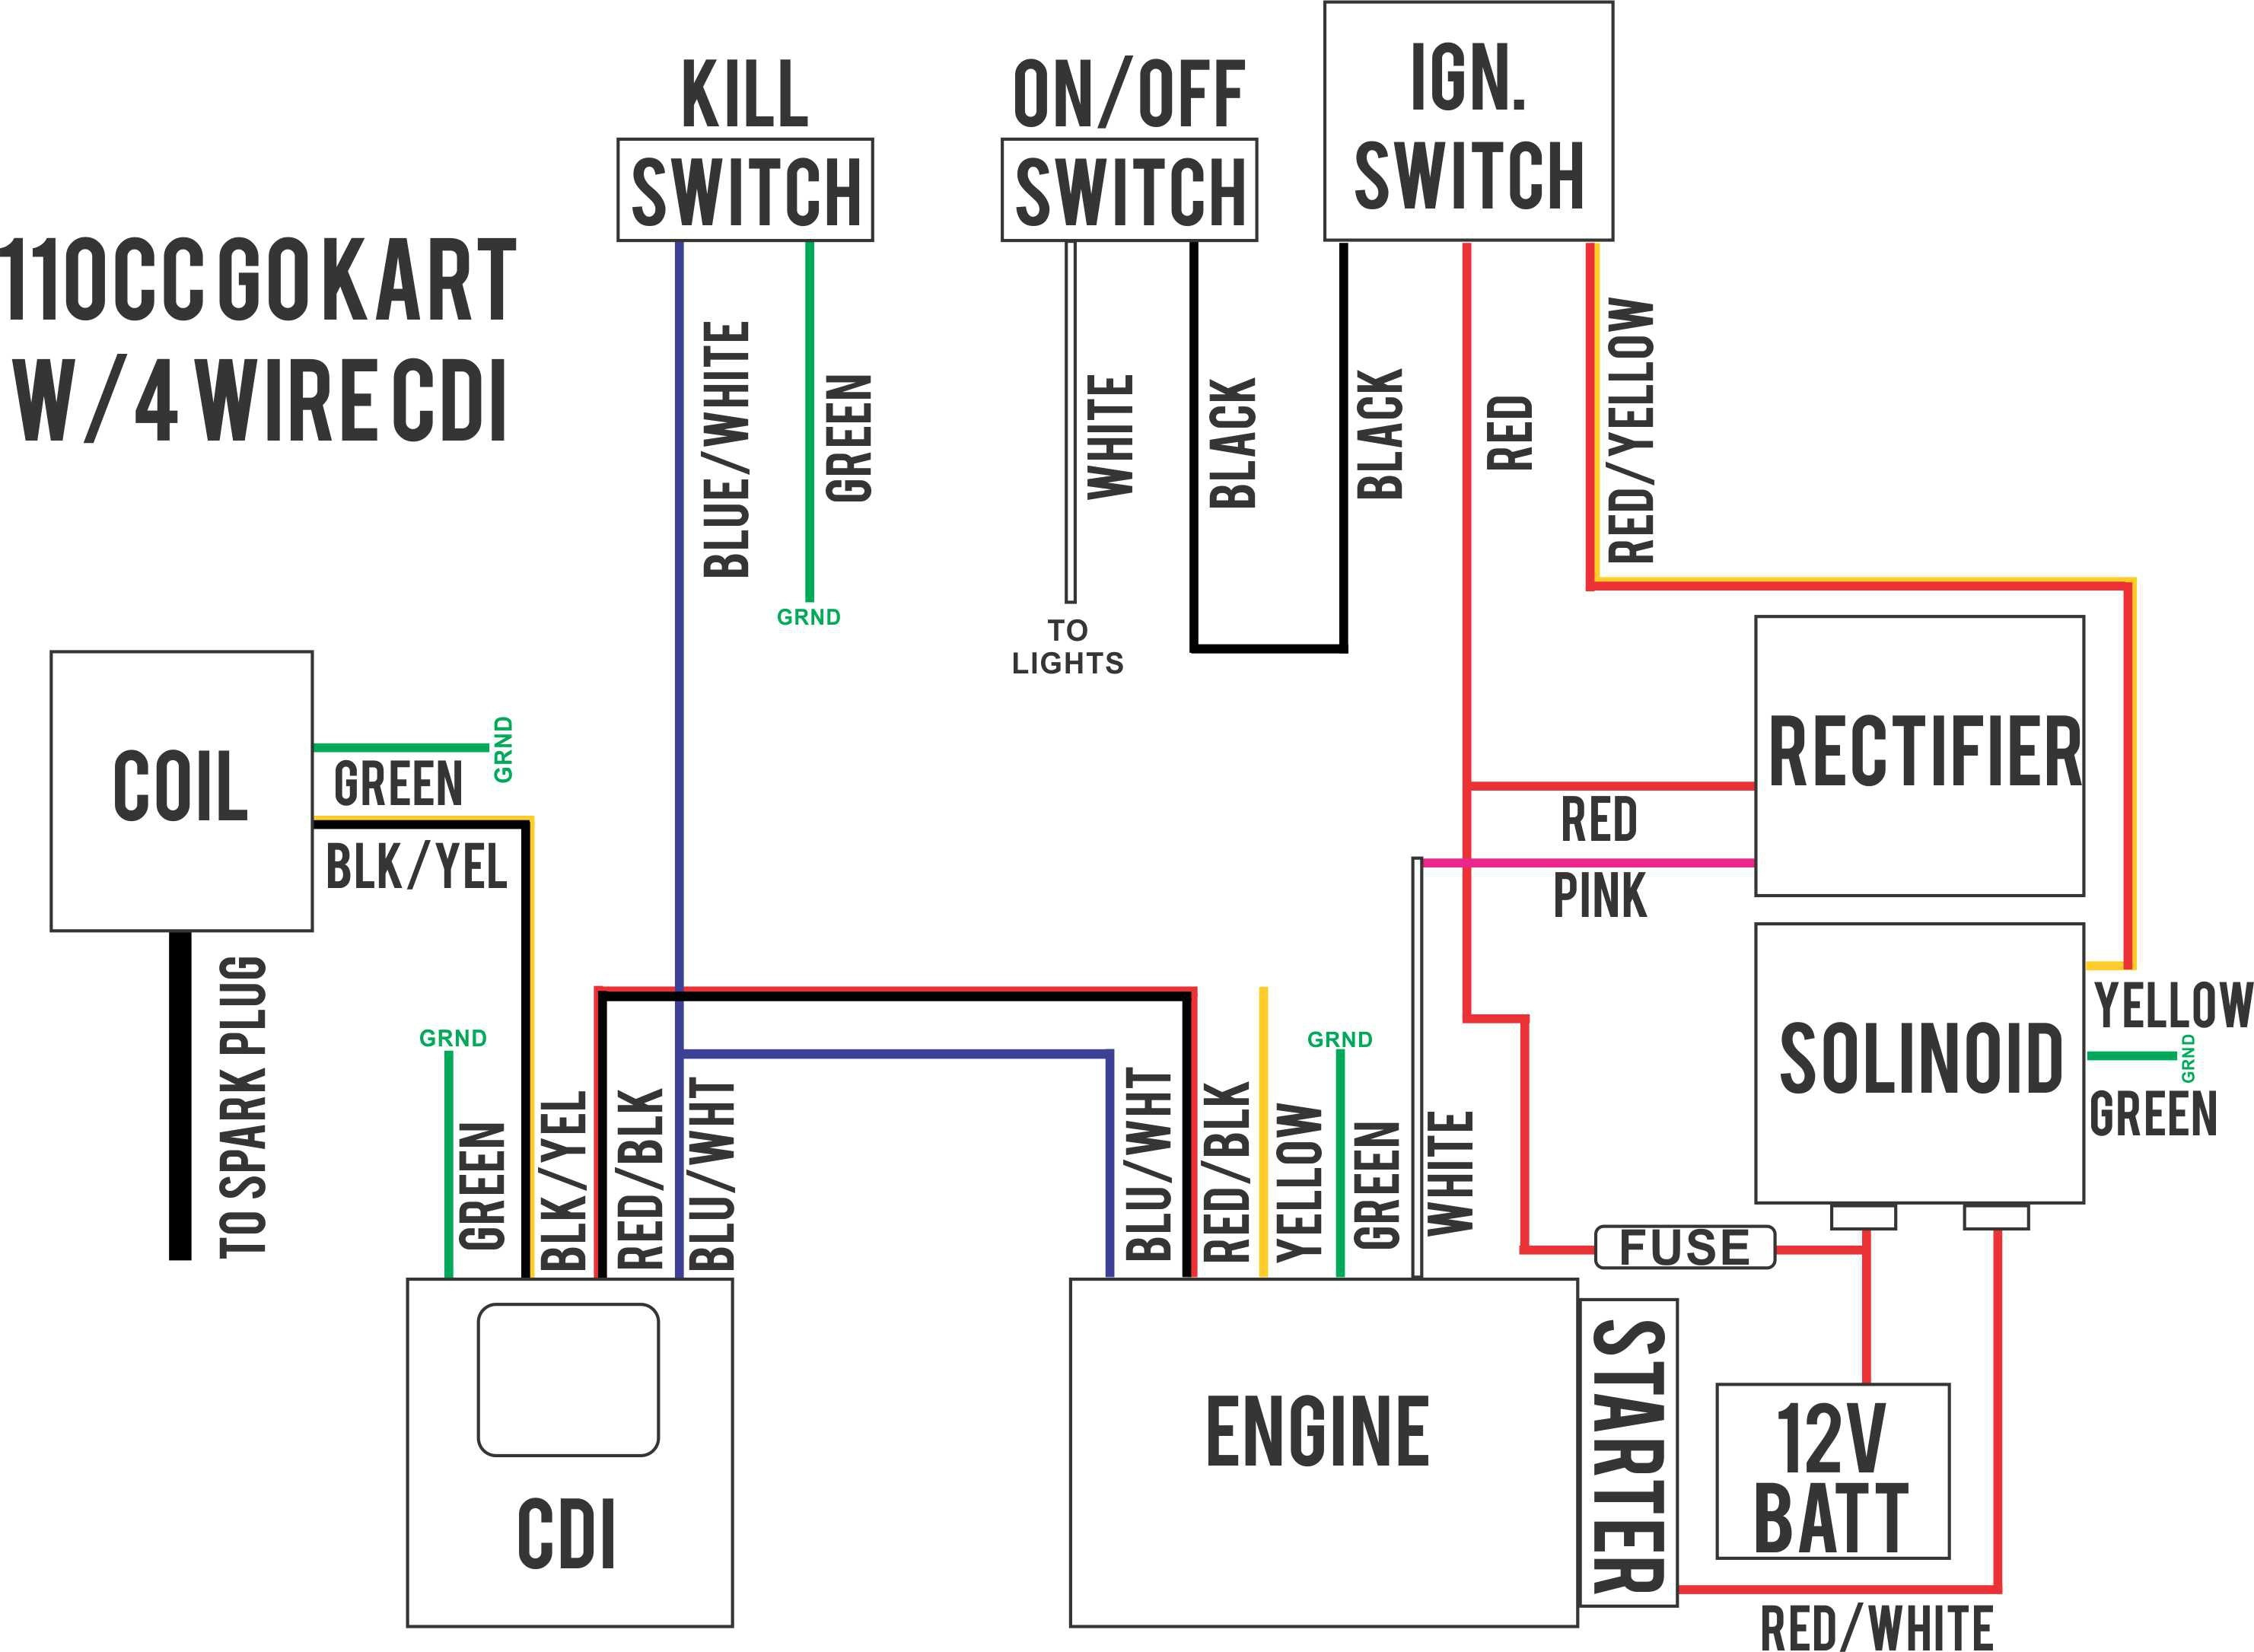 Kymco Wiring Diagram - Data Wiring Diagram Today - Kawasaki Bayou 220 Wiring Diagram